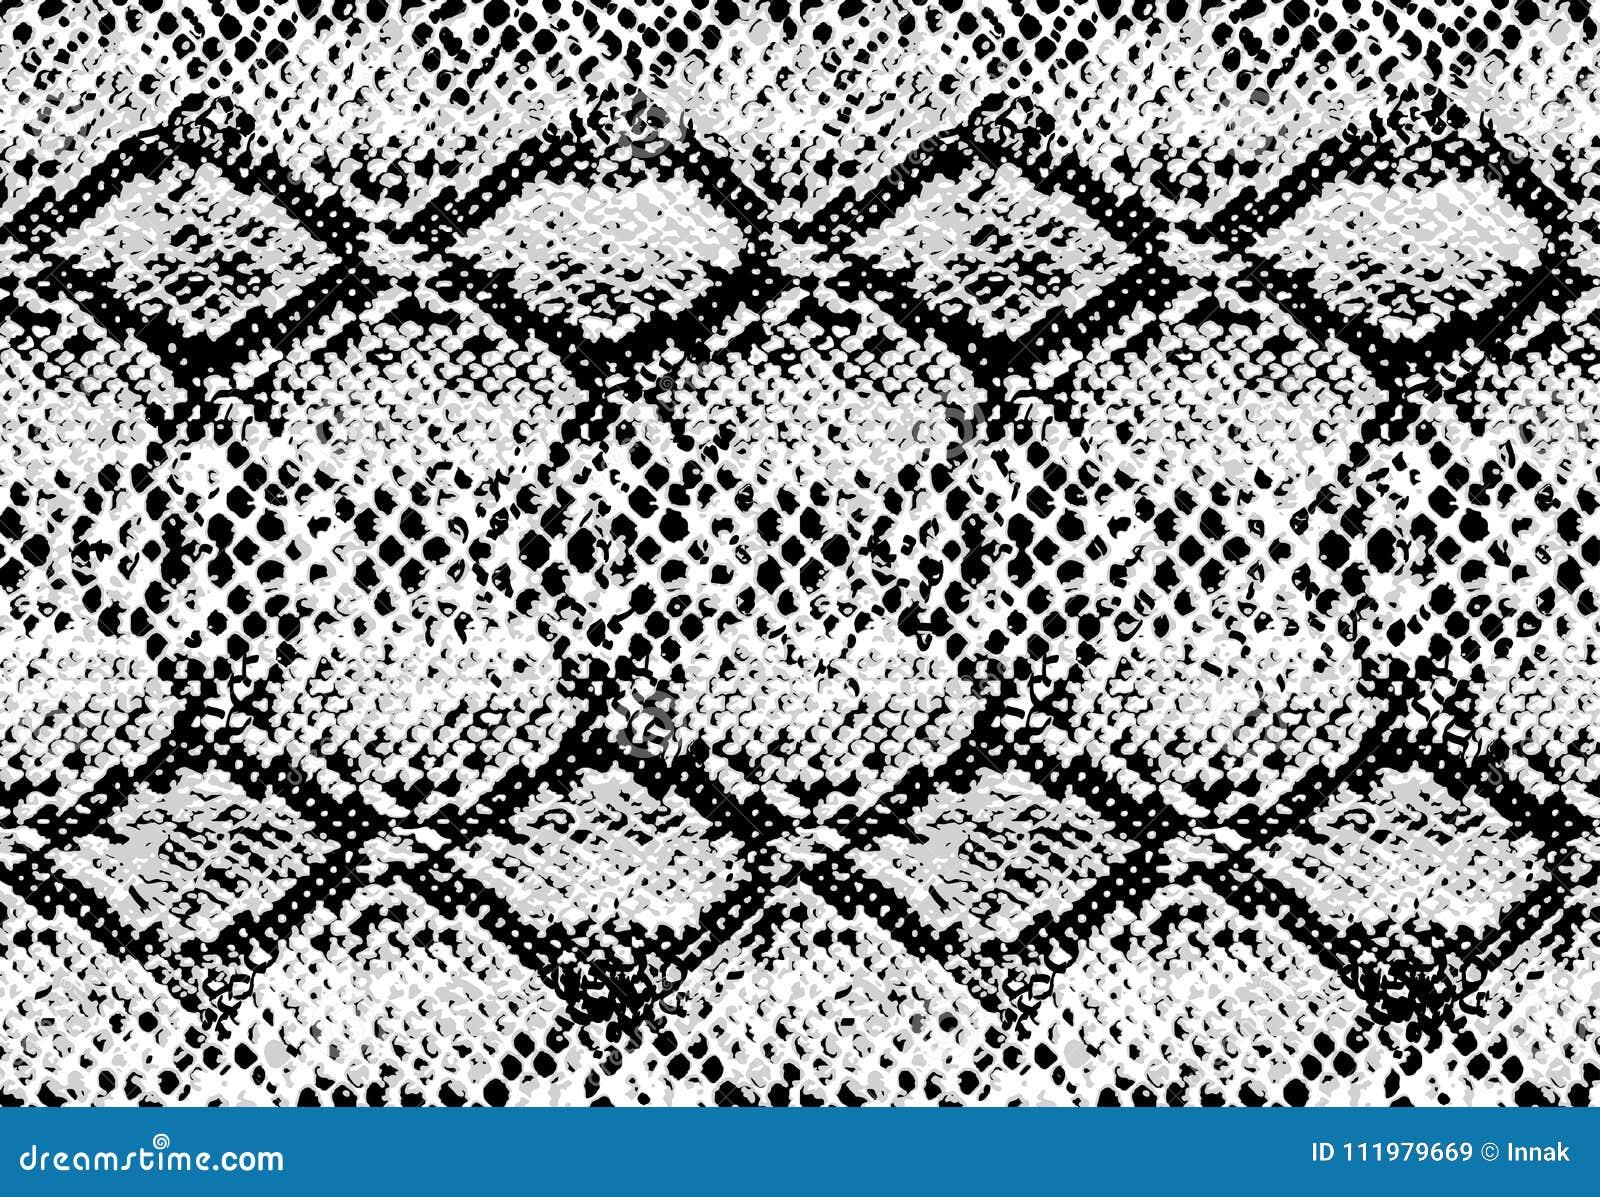 Snake skin pattern texture repeating seamless monochrome black & white. Vector